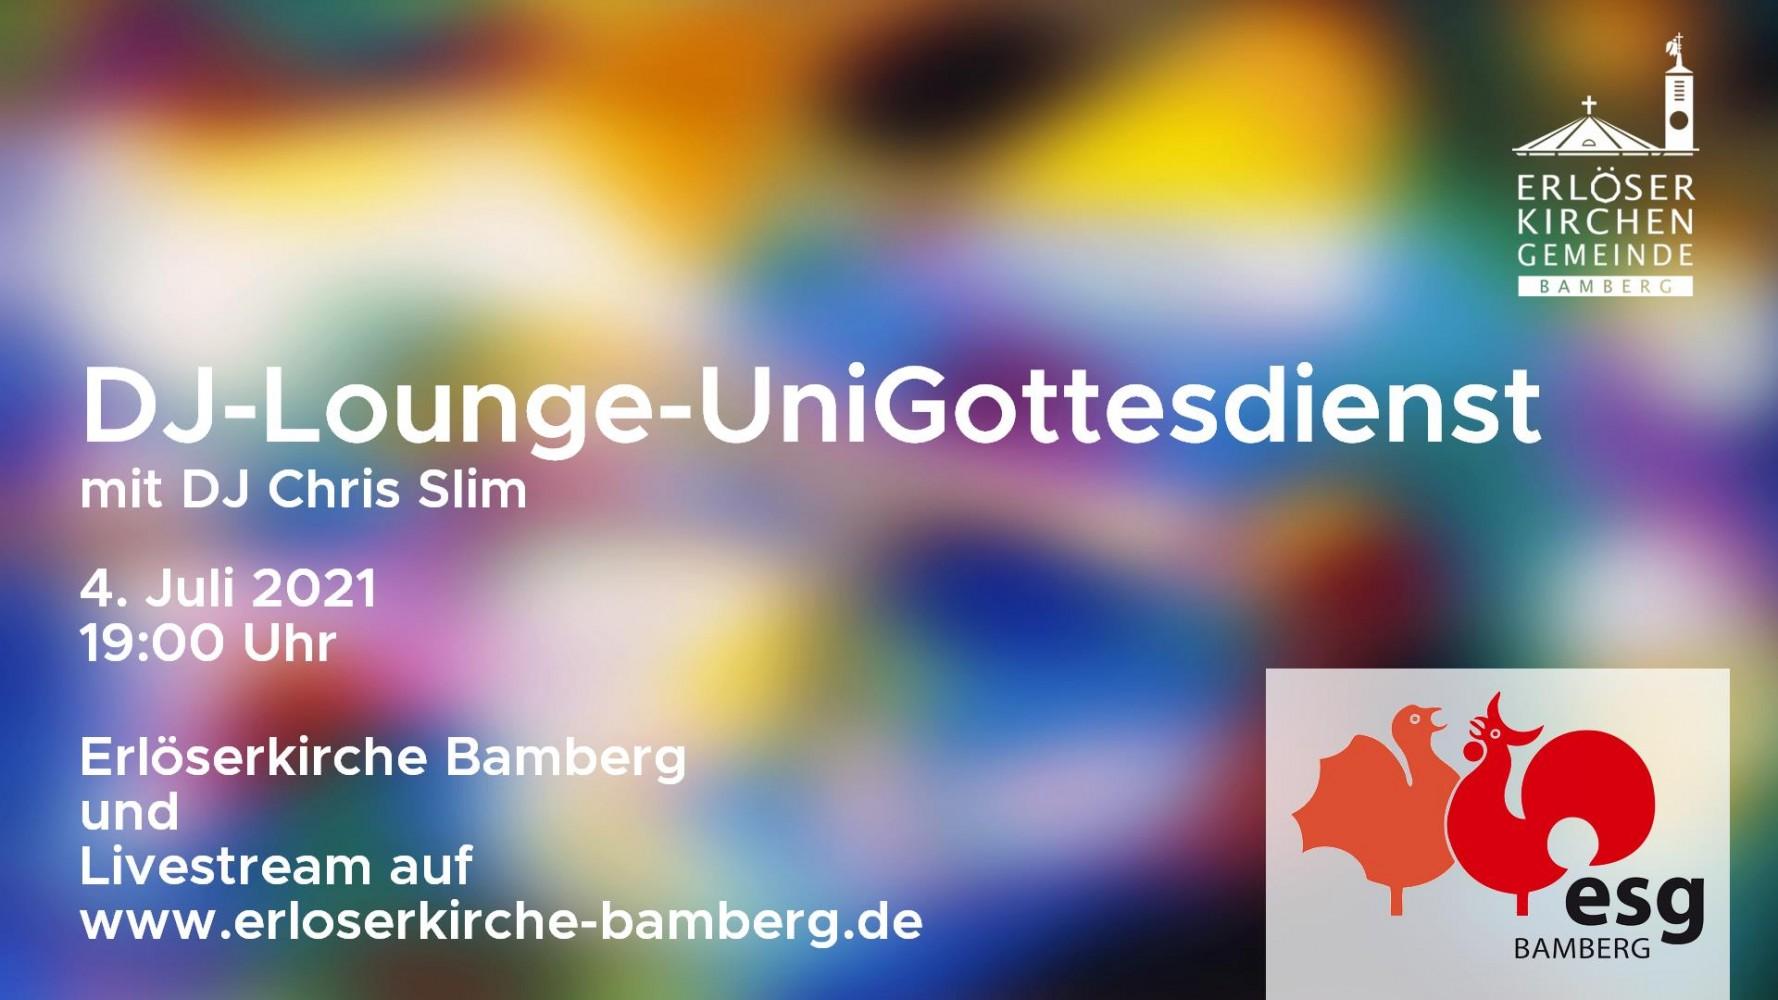 Teaser DJ-Lounge-UniGottesdienst am 4. Juli 2021